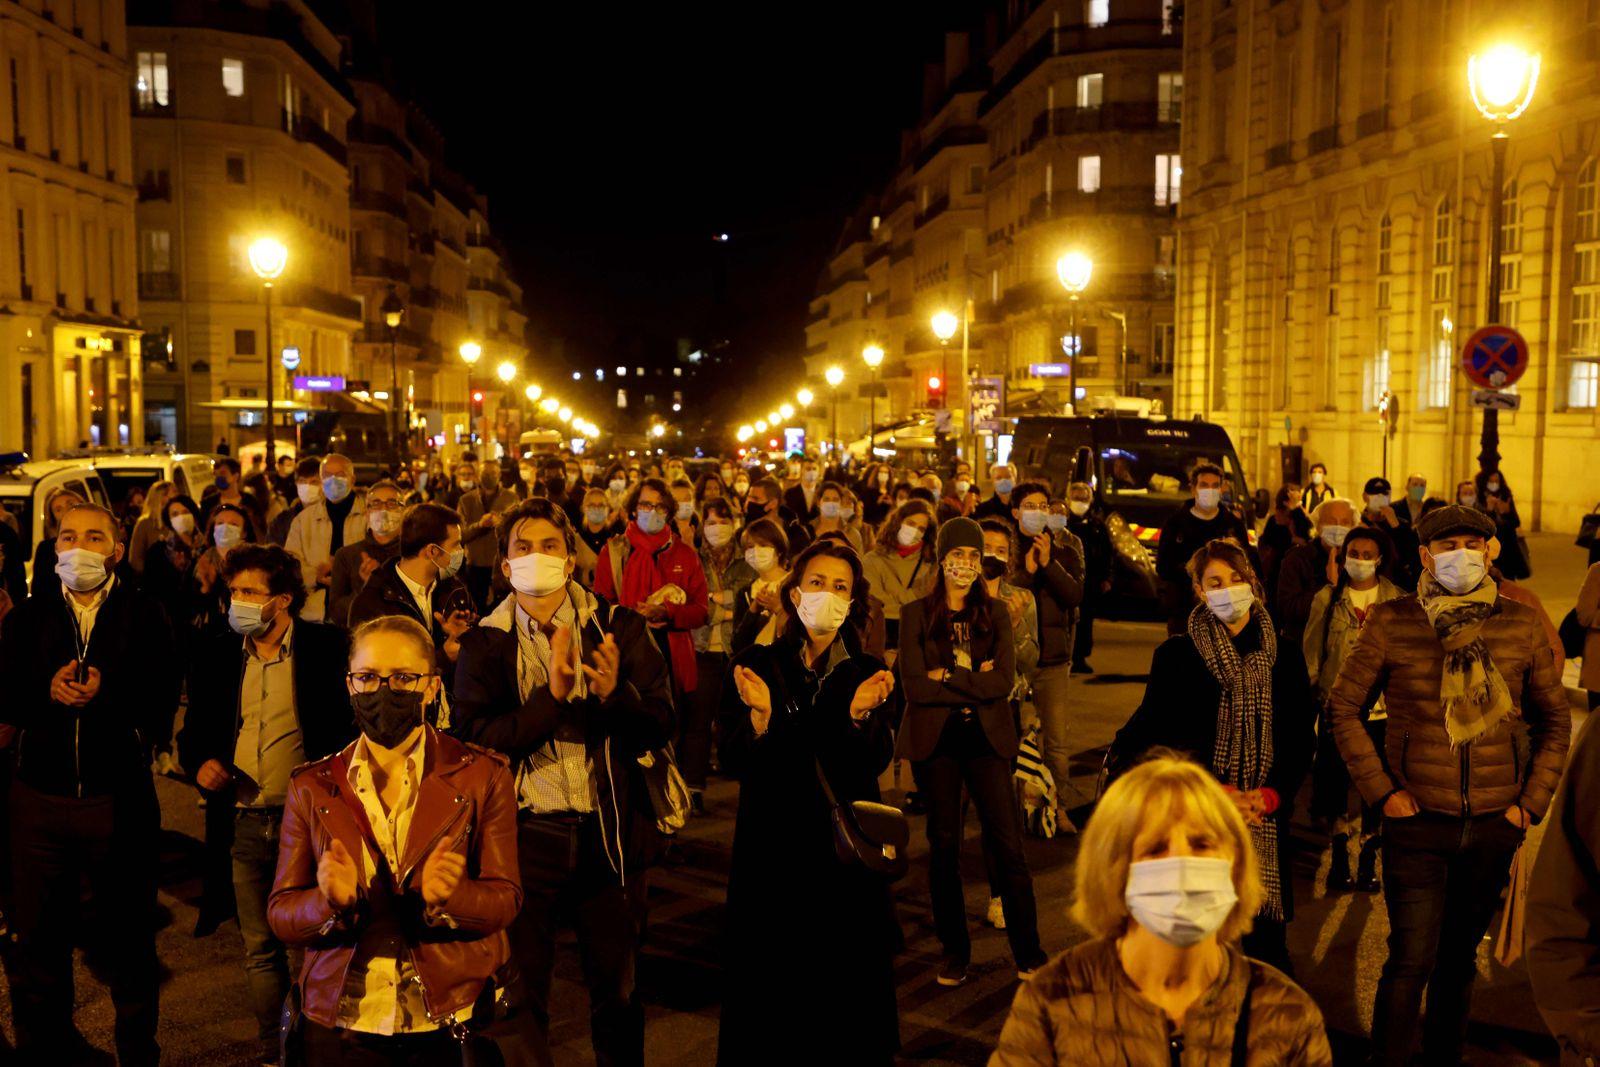 FRANCE-ATTACK-EDUCATION-RELIGION-POLITICS-CHILDREN